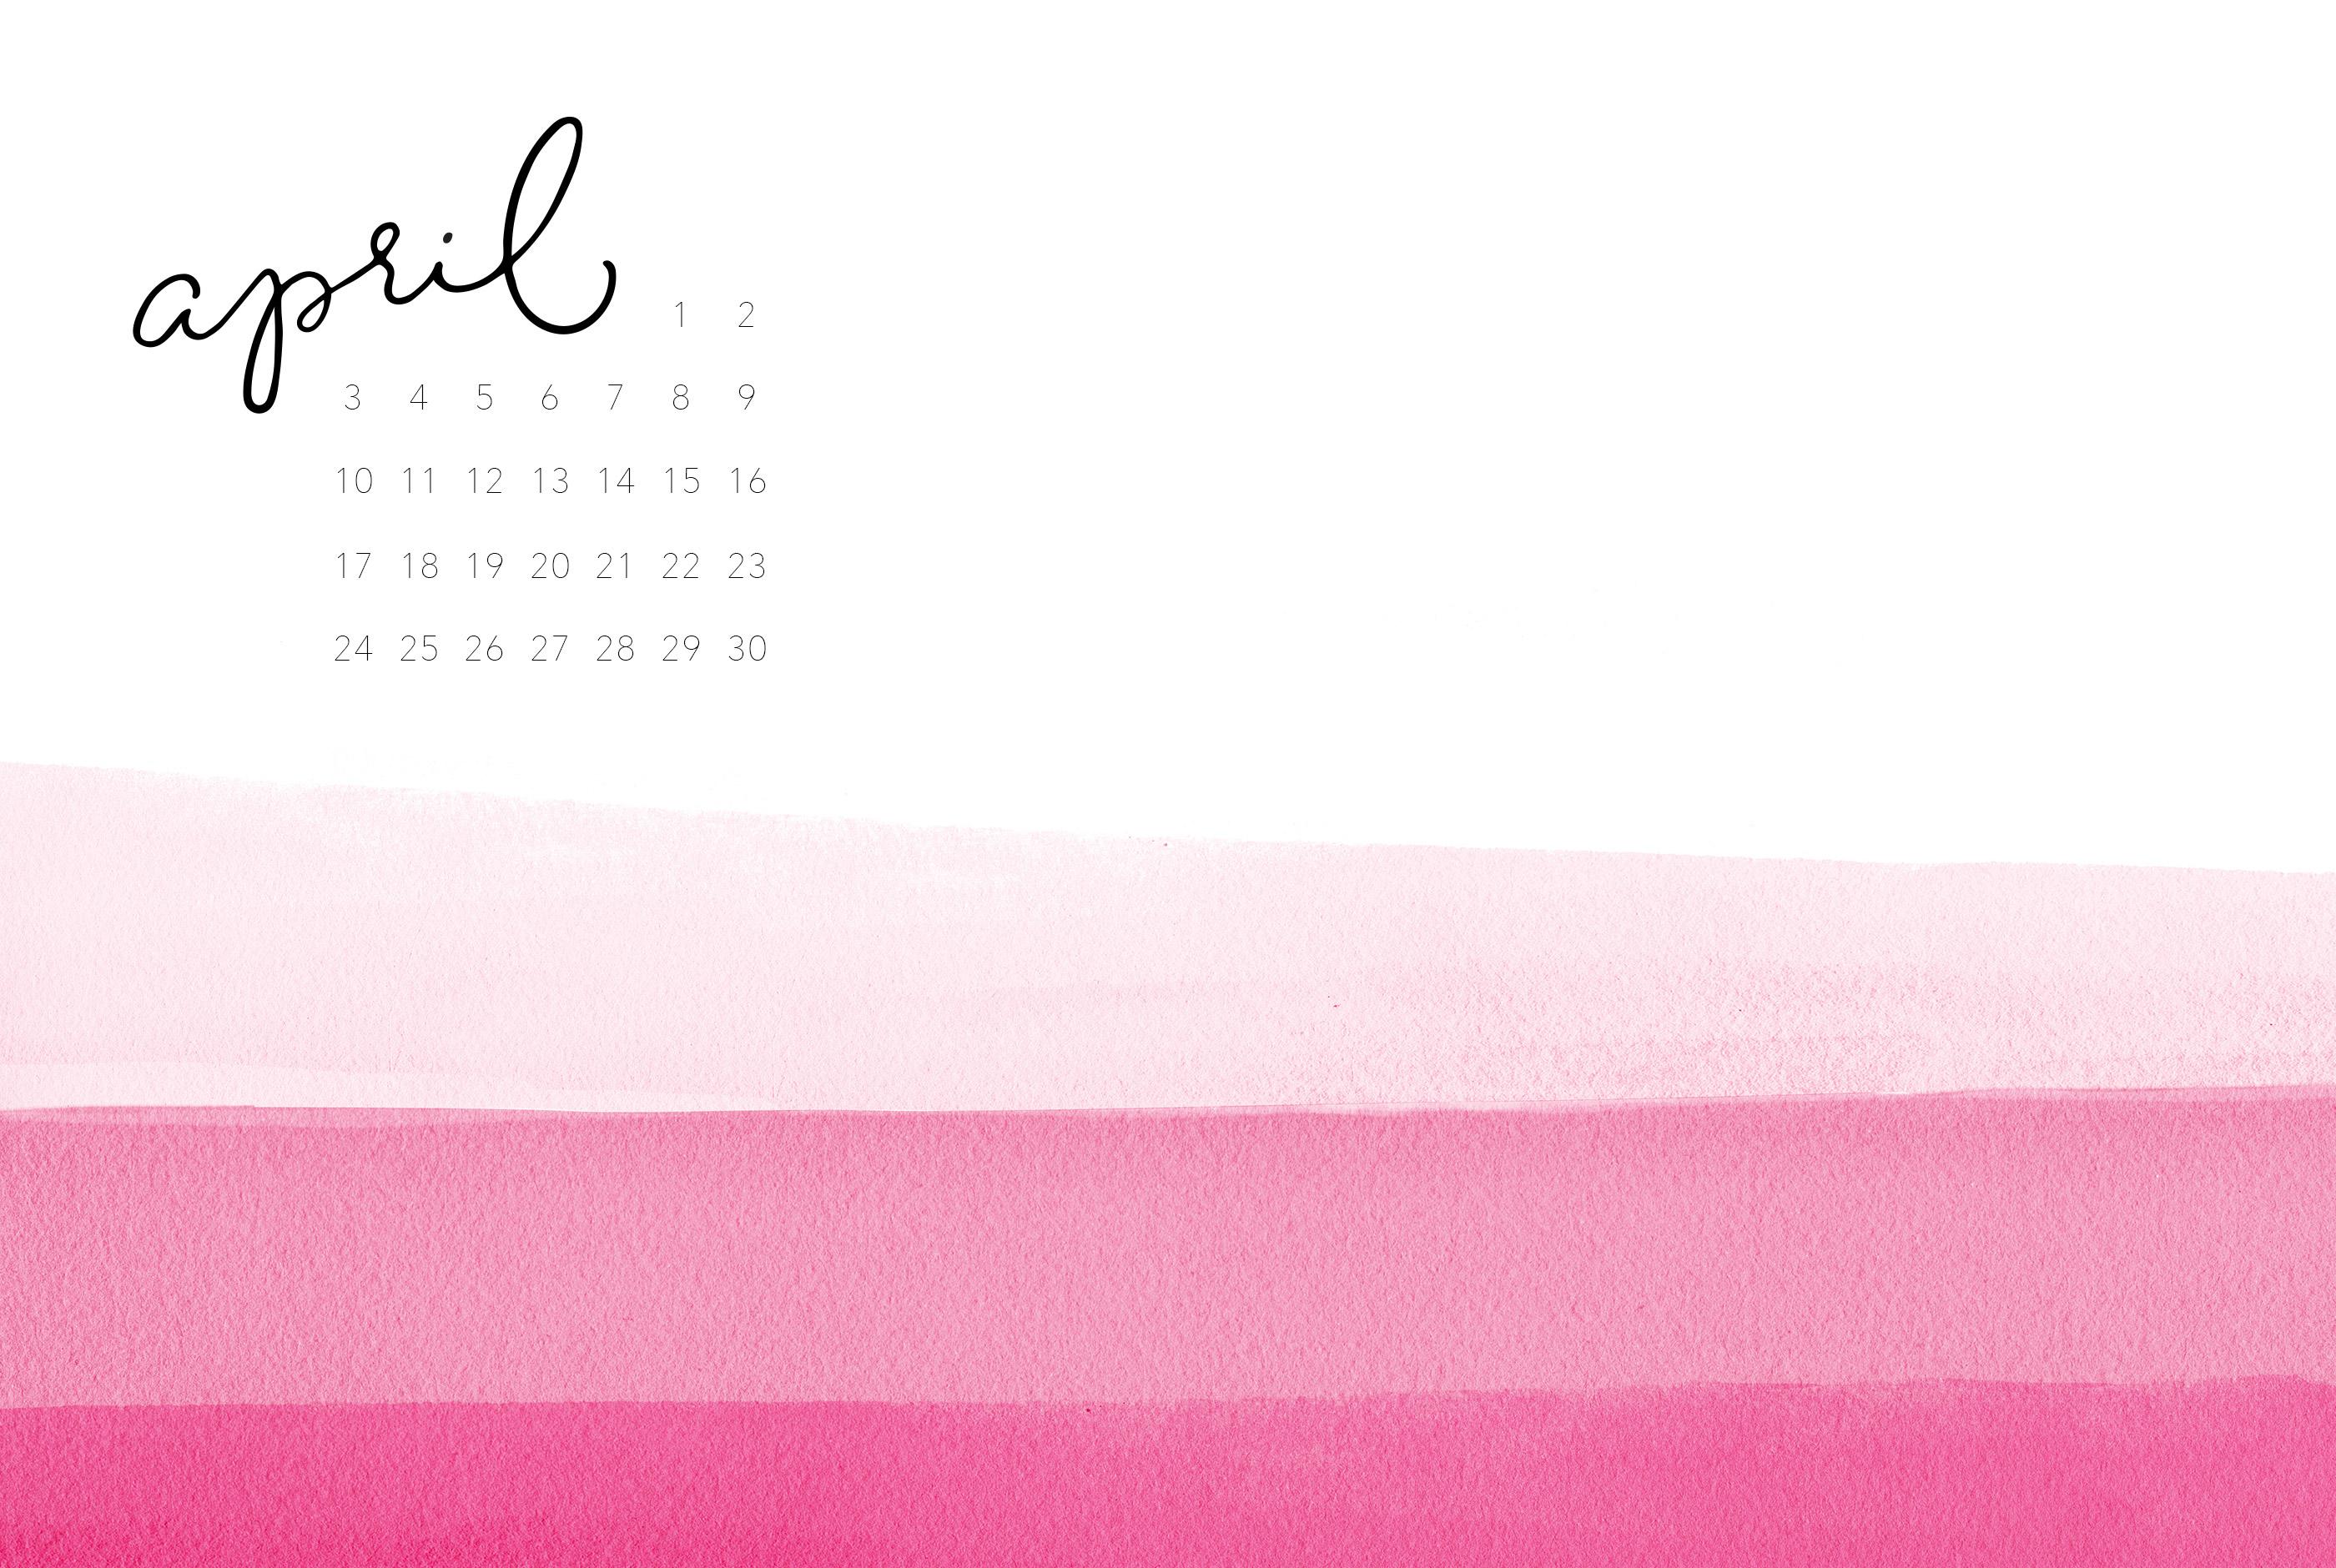 17944 wallpapers for desktop april 2016 2800x1880